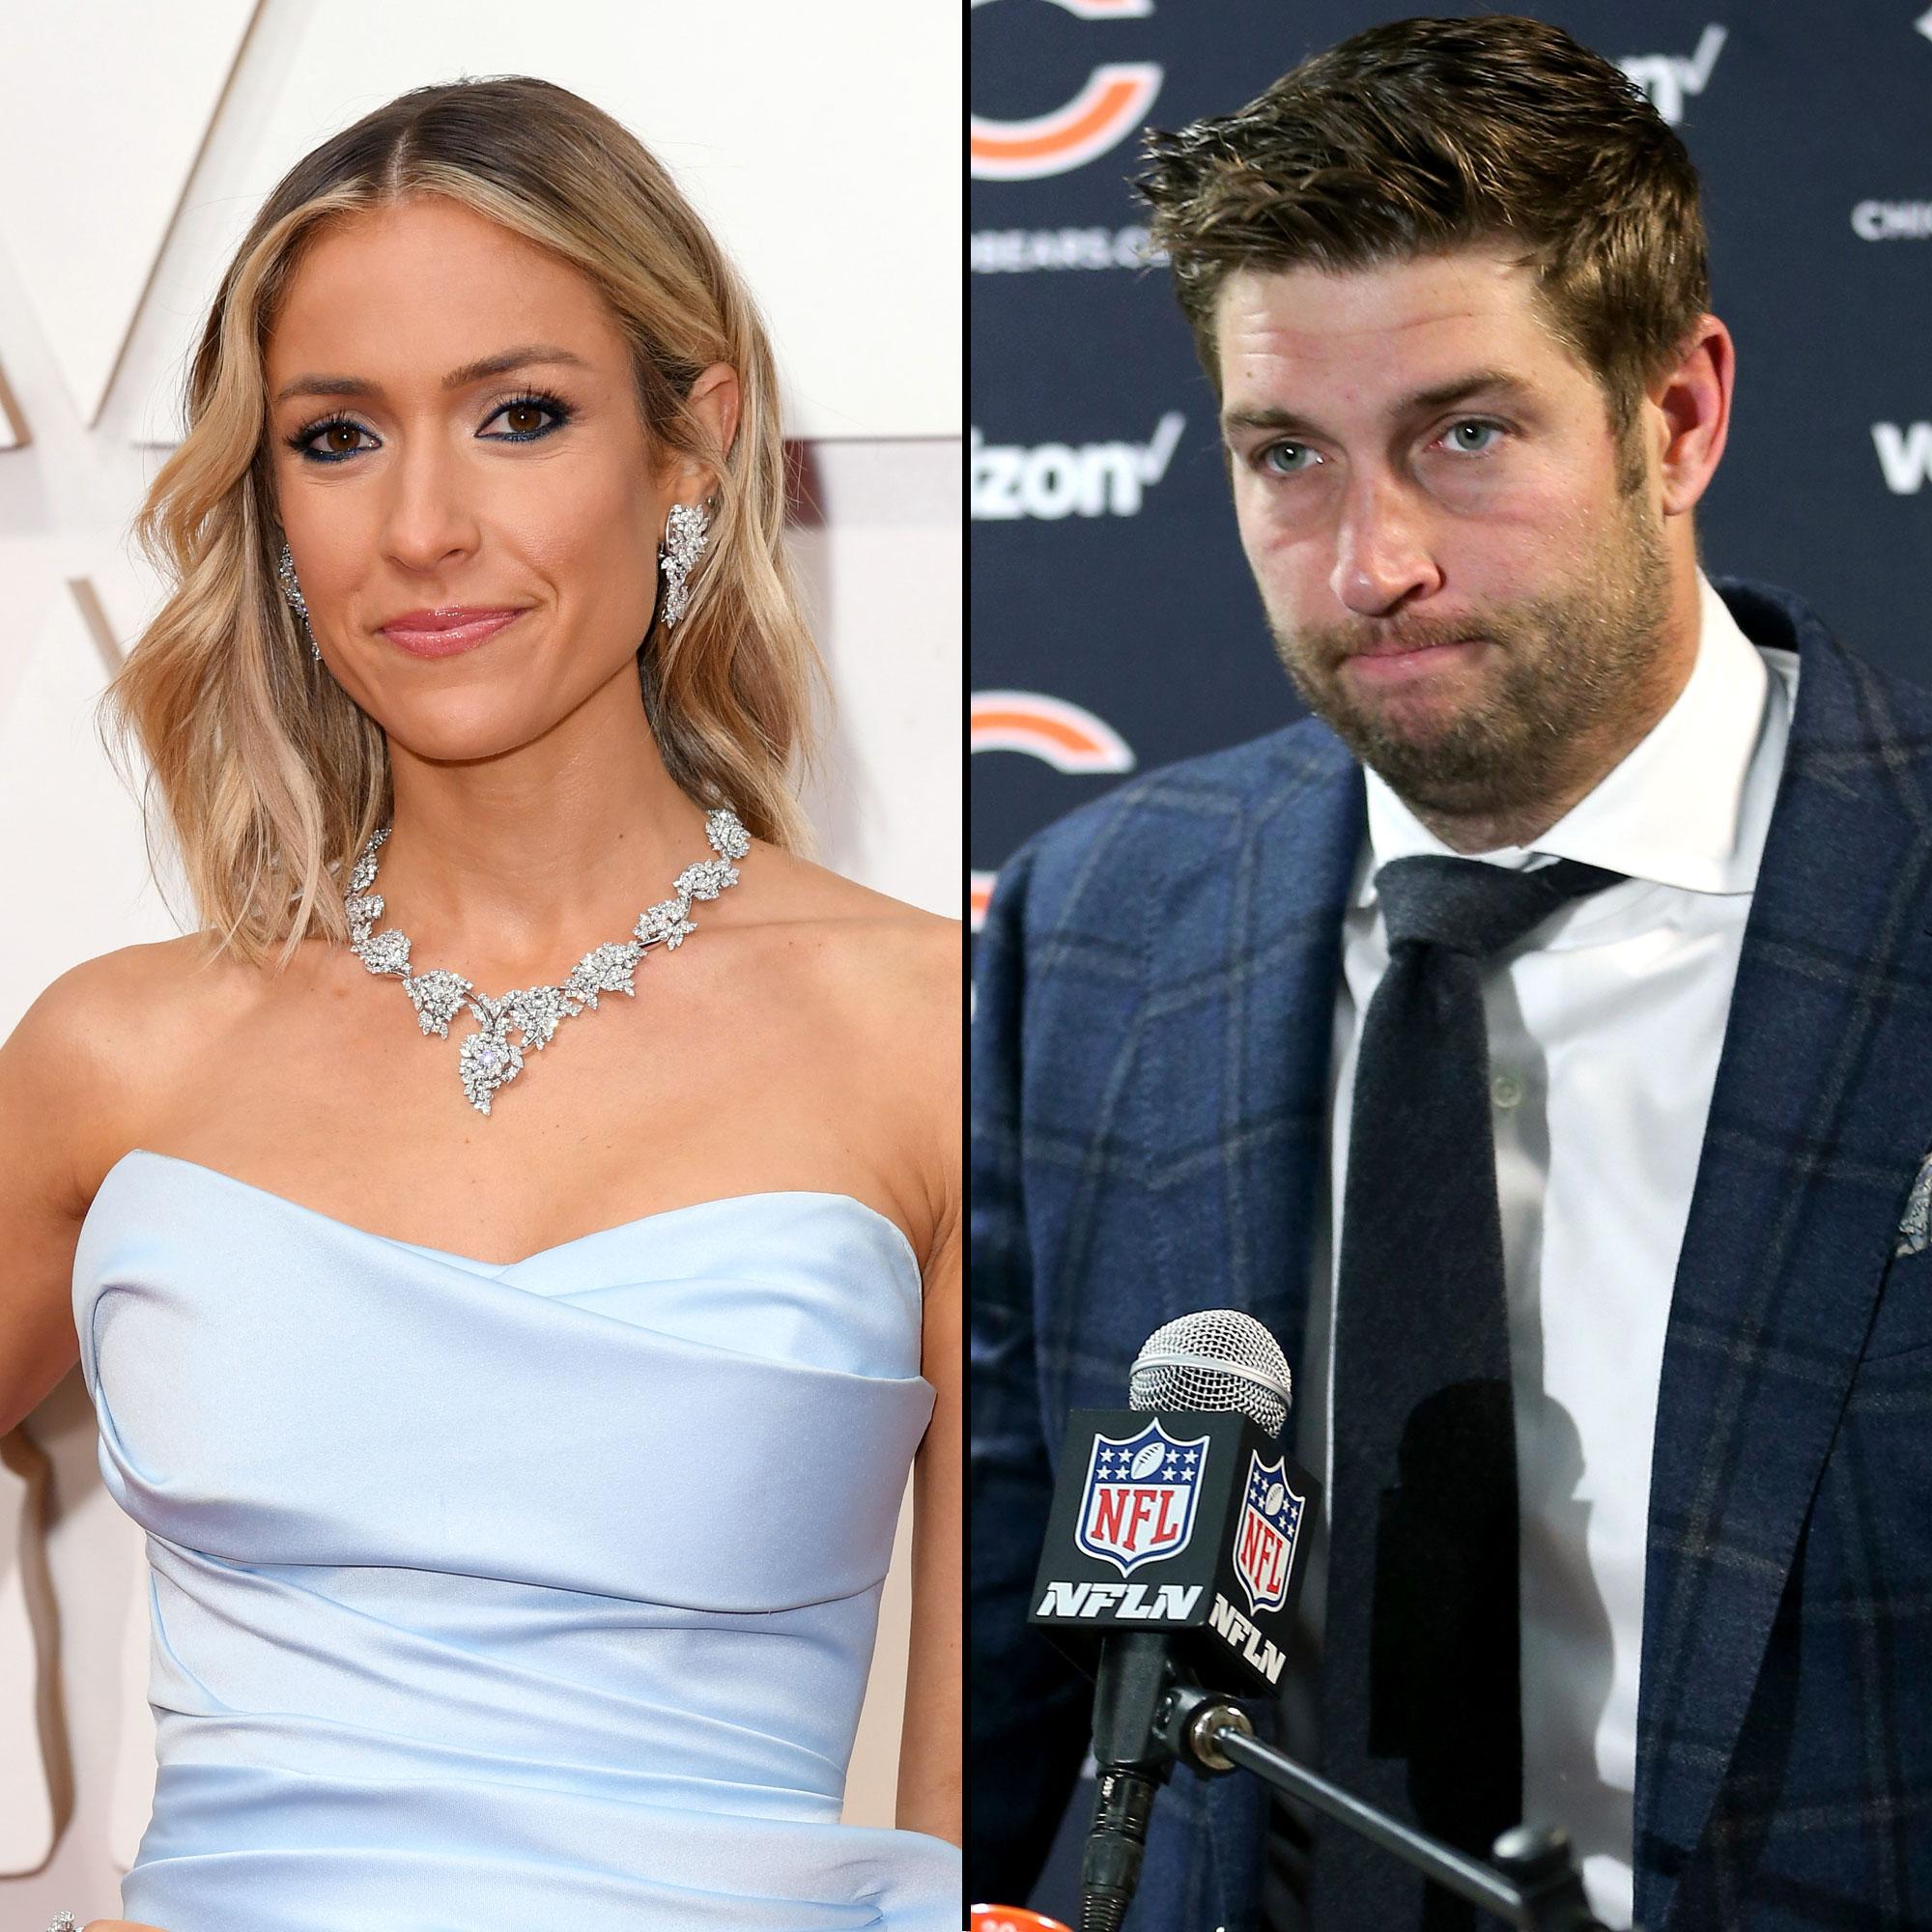 Kristin Cavallari Drops Wife From Instagram Bio After Announcing Jay Cutler Split